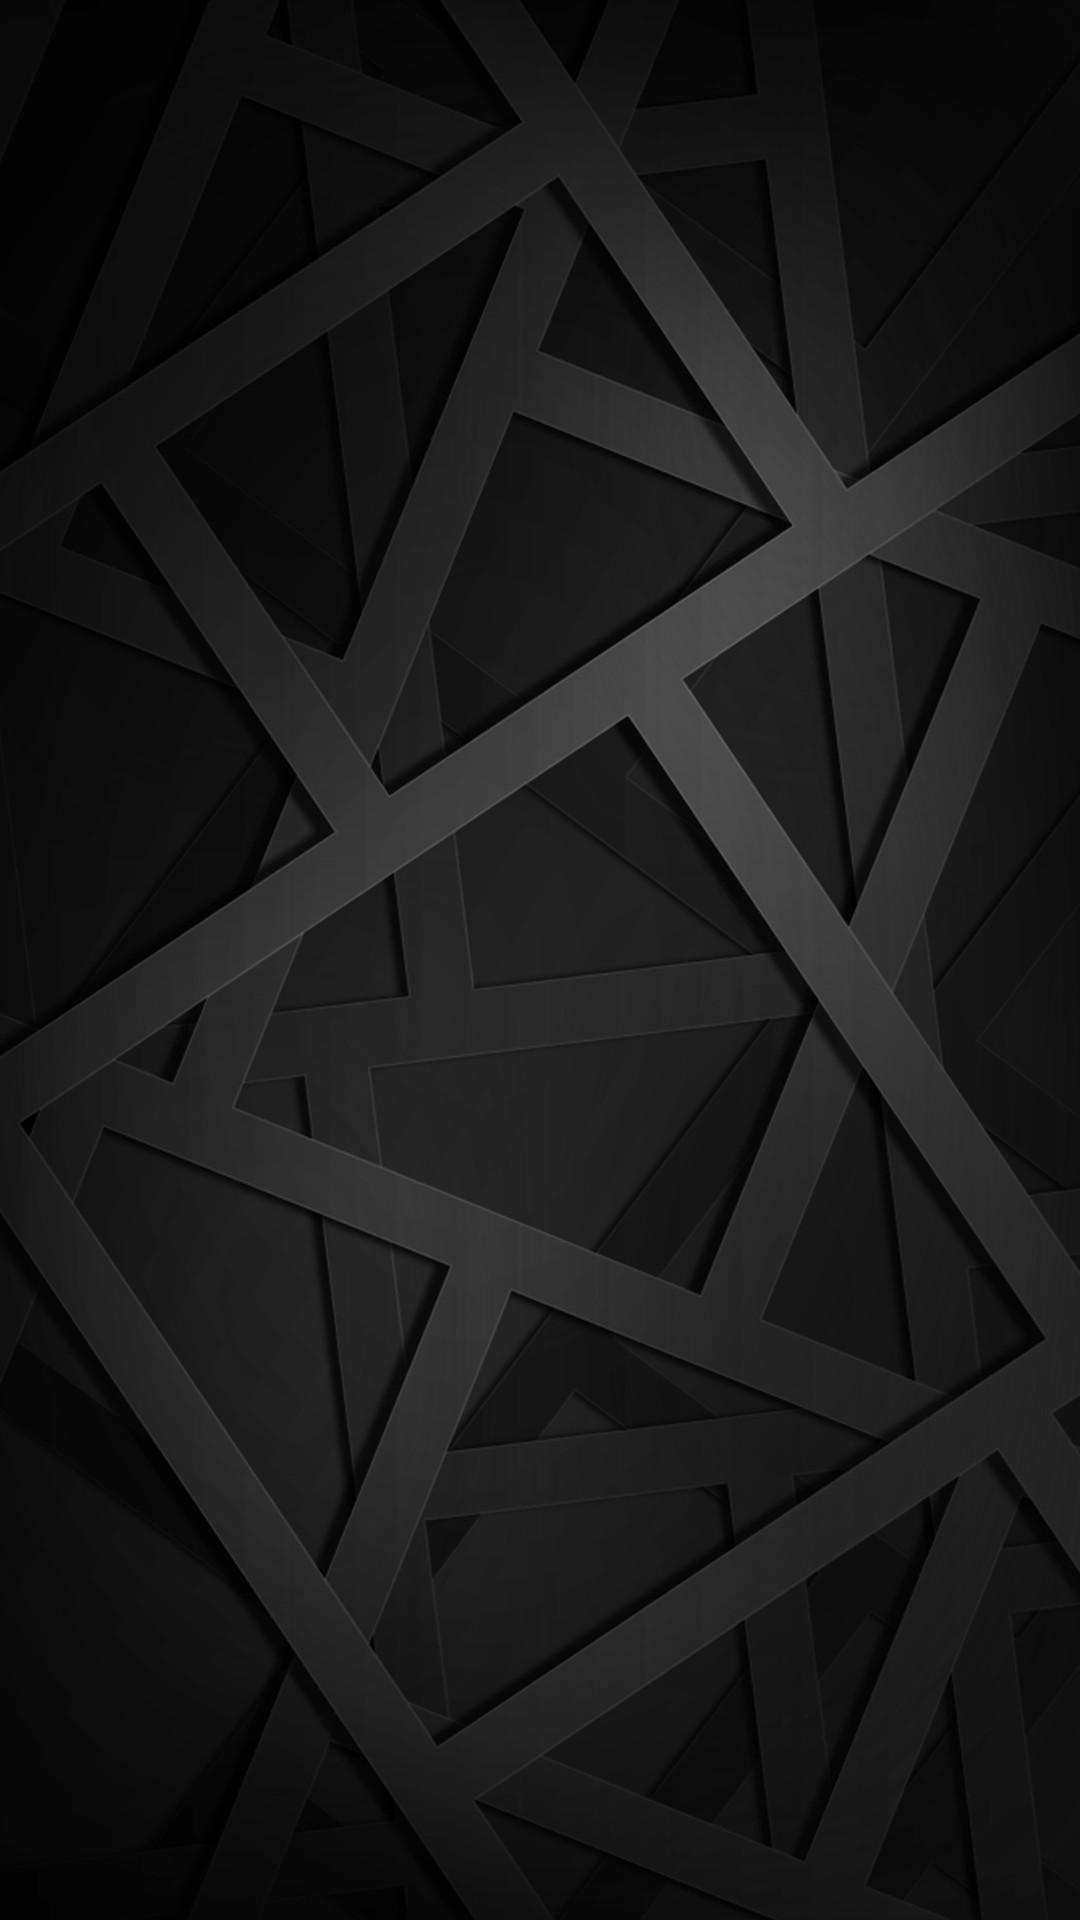 Res: 1080x1920, Geometric Black 1080 x 1920 FHD Wallpaper Geometric Black 1080 x 1920 FHD Wallpaper